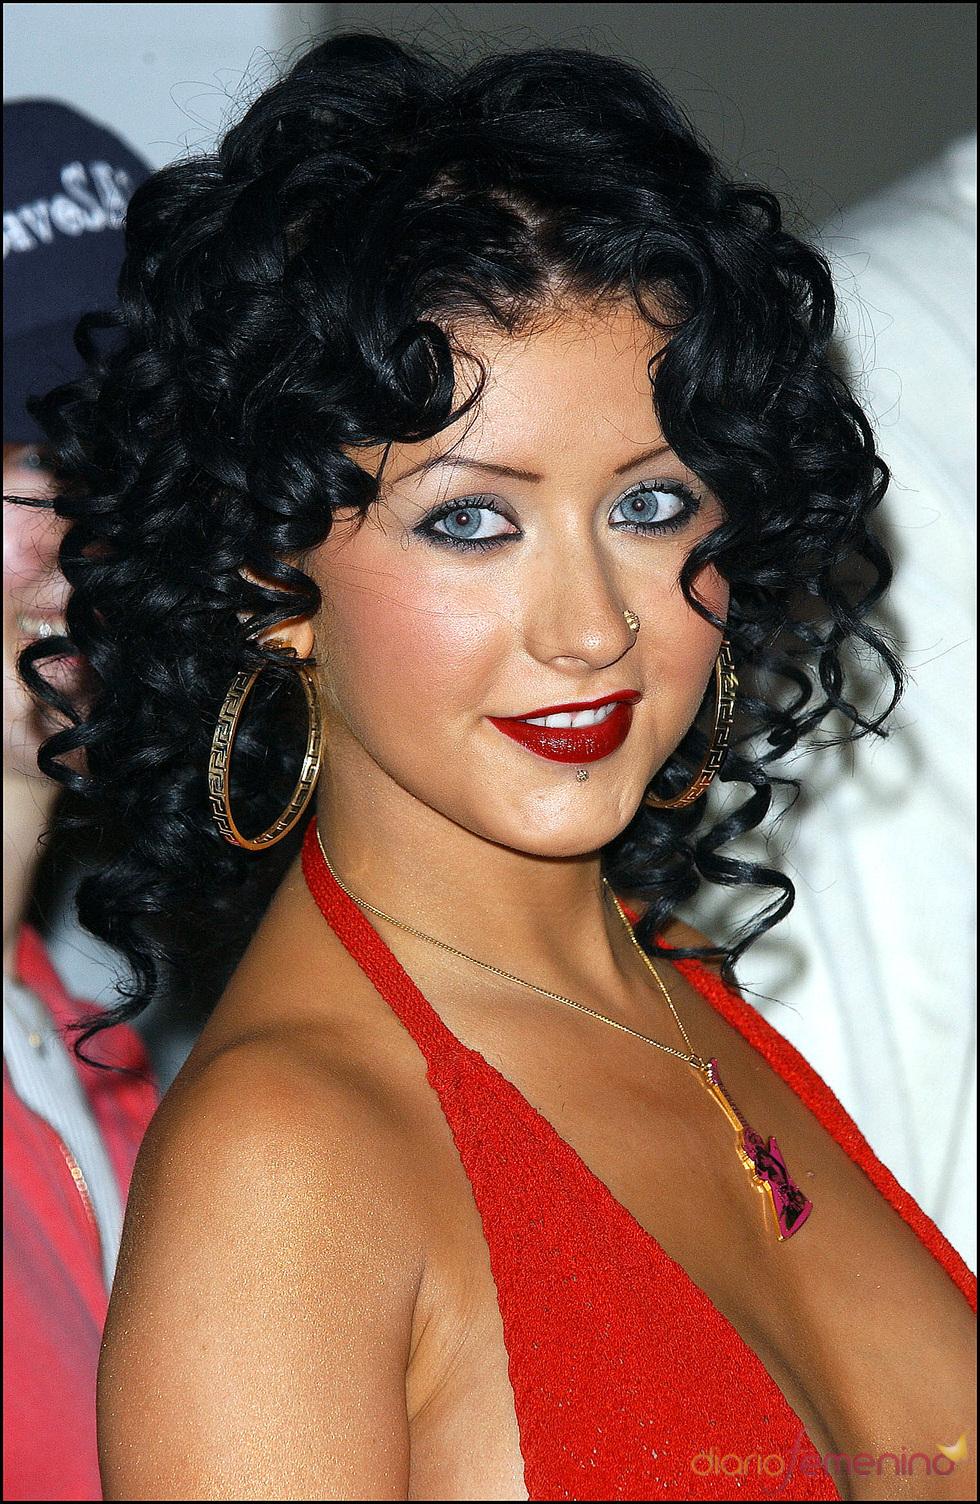 Christina Aguilera morena y con rizos